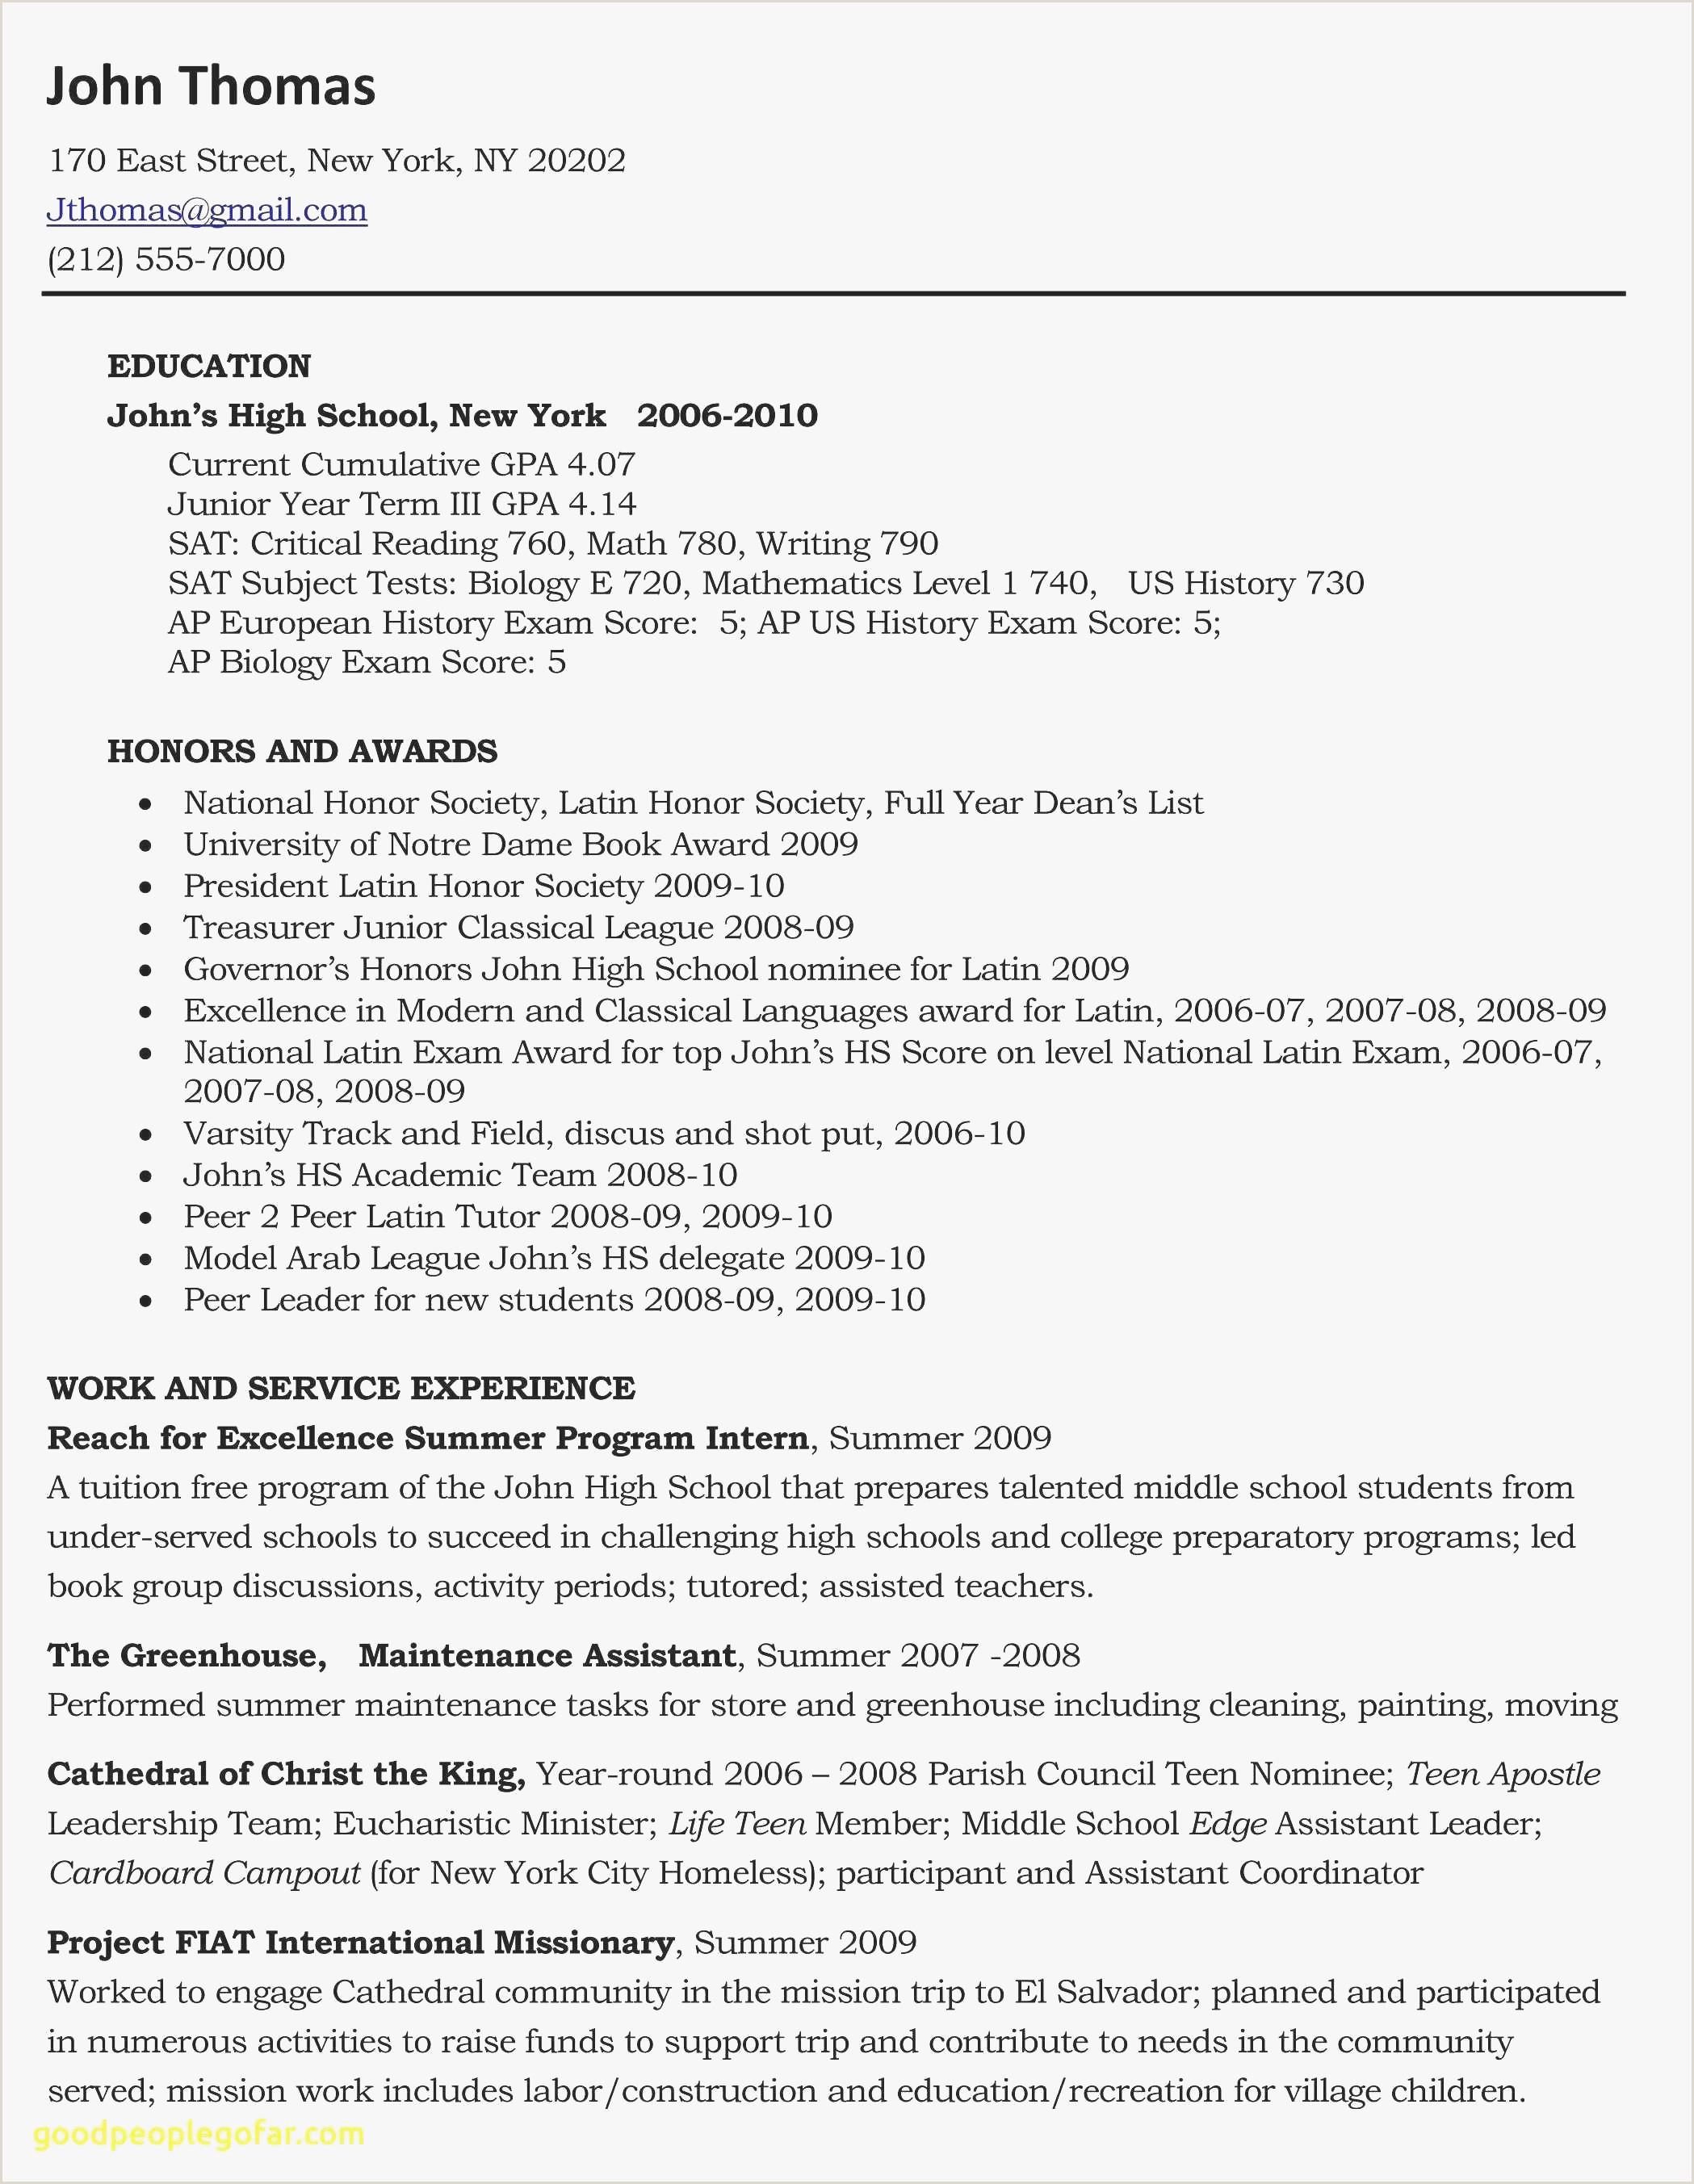 Resume Example Free Sample 50 Word Resume Template Free